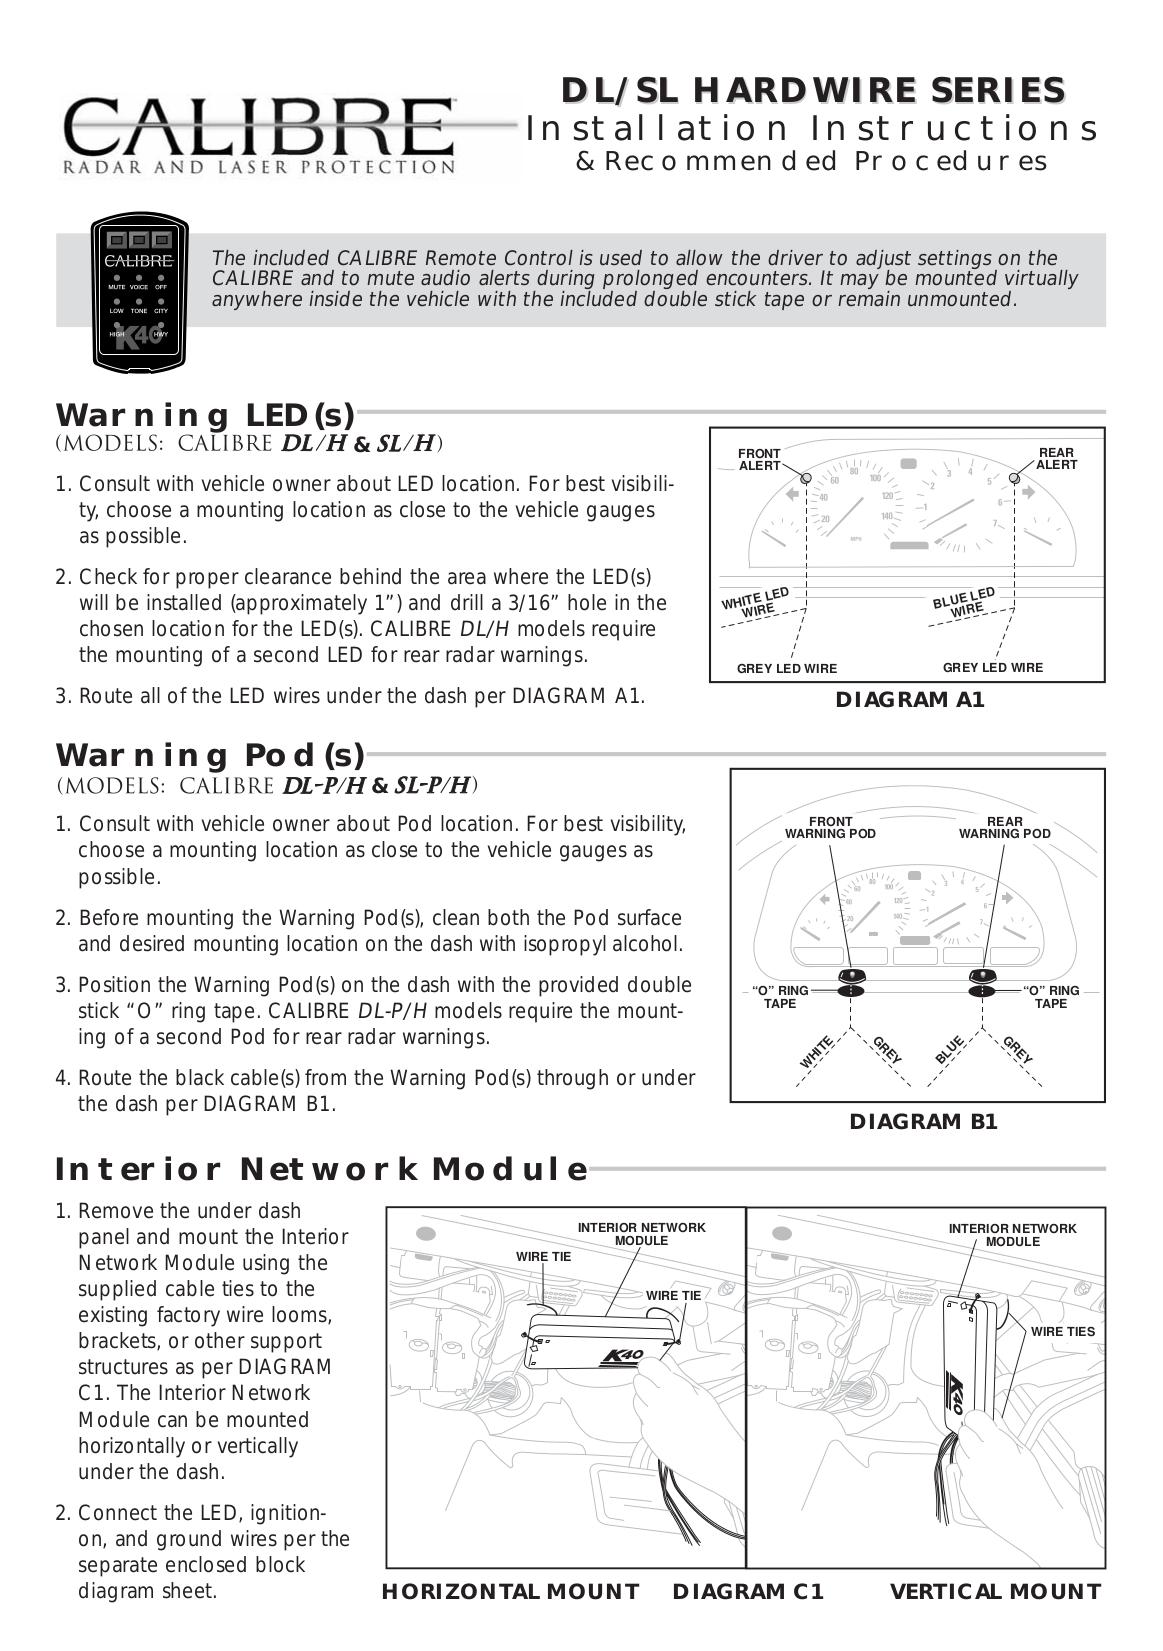 pdf manual for k40 radar detector calibre dl p Uniden Radar Detector k40 radar detector calibre dl p pdf page preview